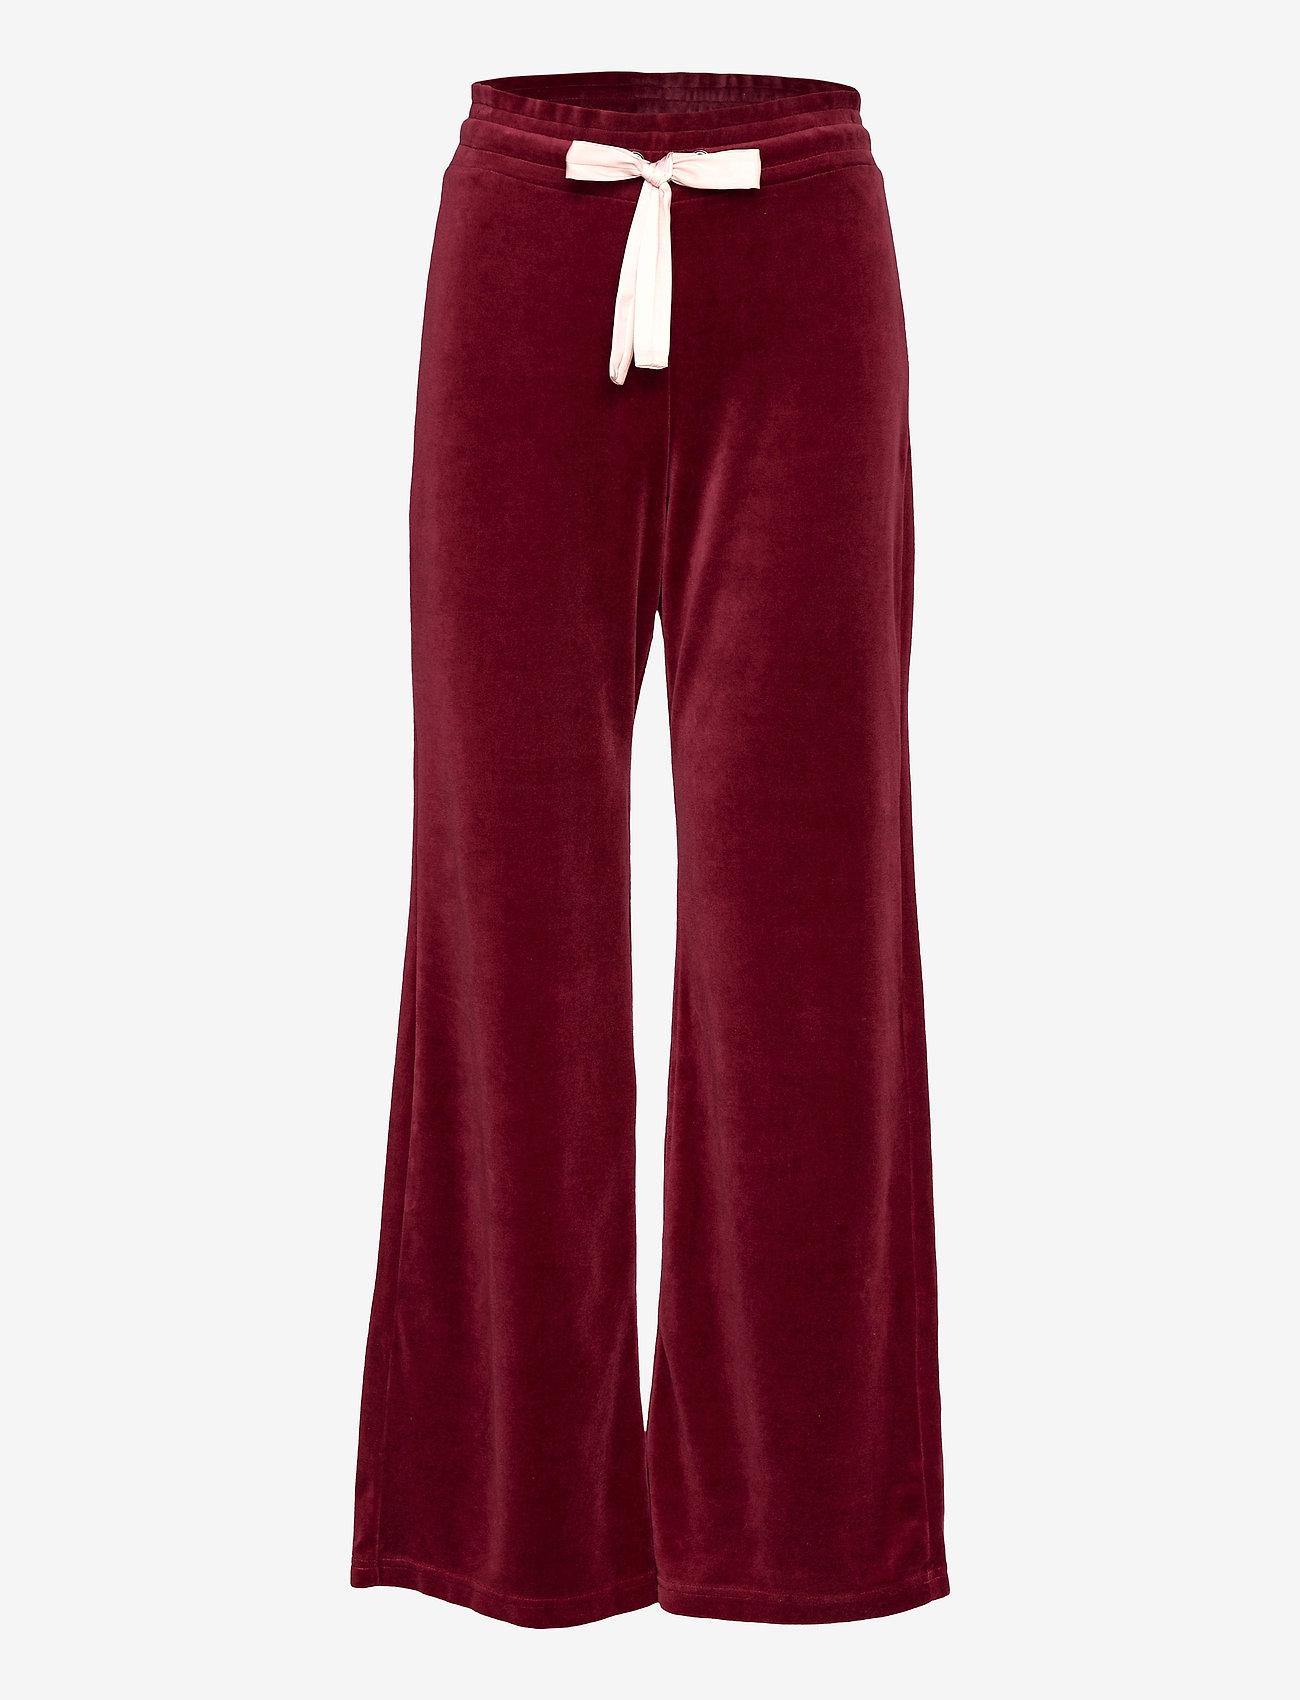 ODD MOLLY - Marion Pants - sweatpants - baked burgundy - 1